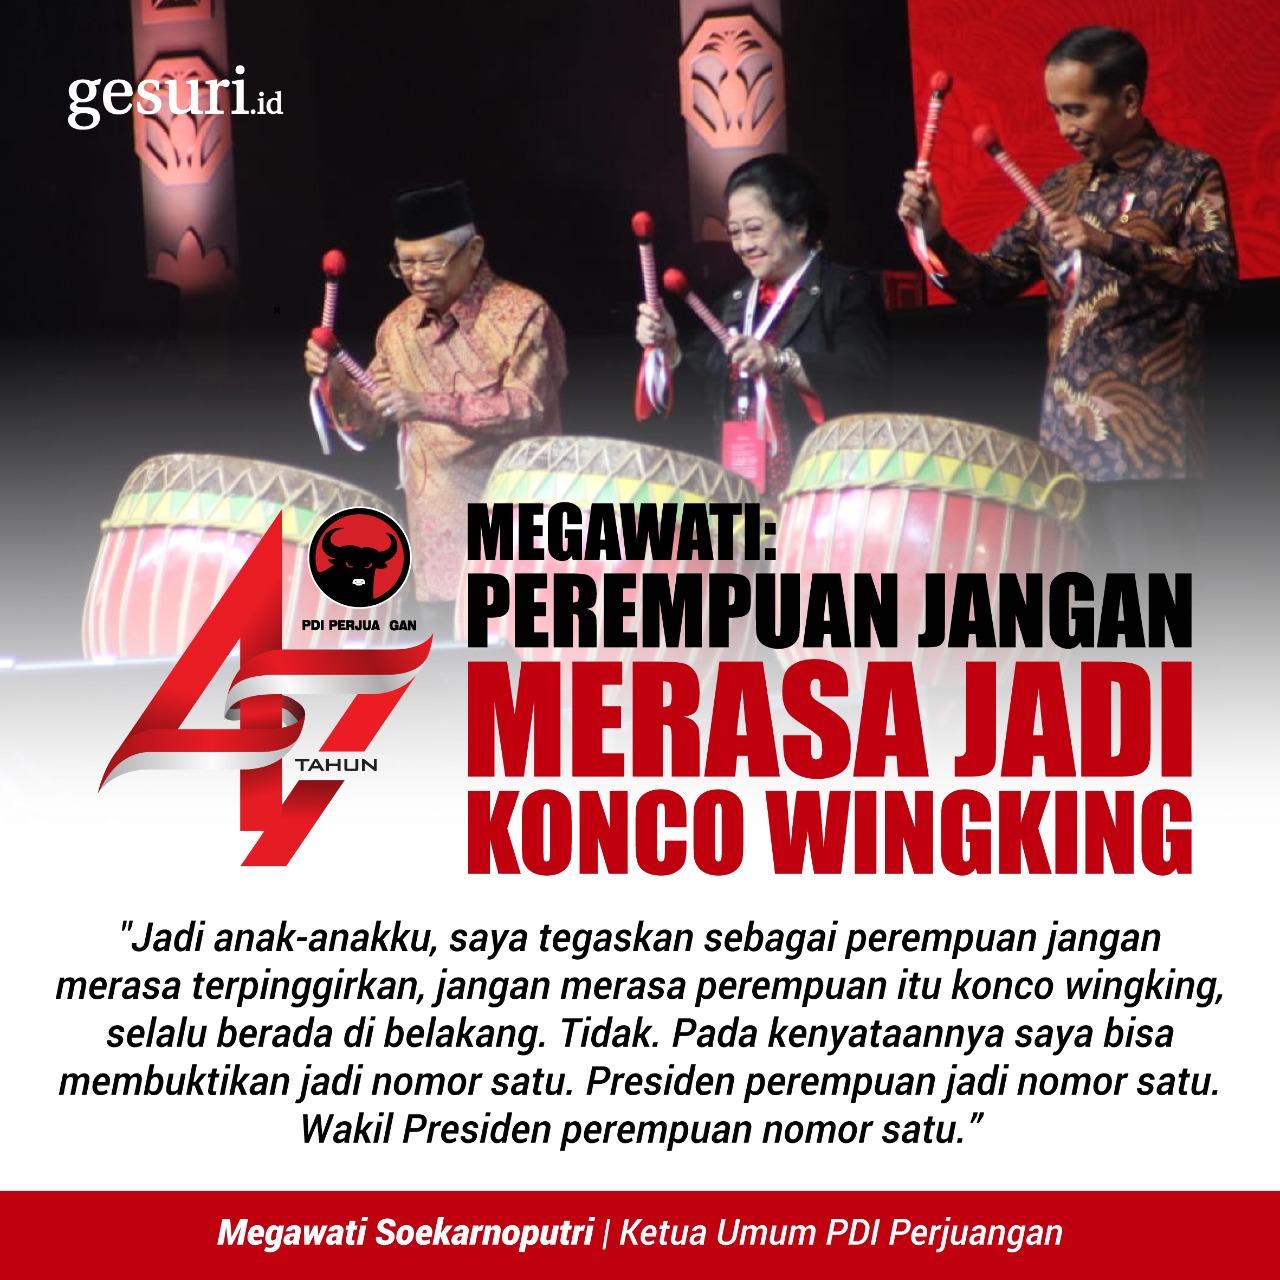 Megawati: Perempuan Jangan Merasa Jadi Konco Wingking